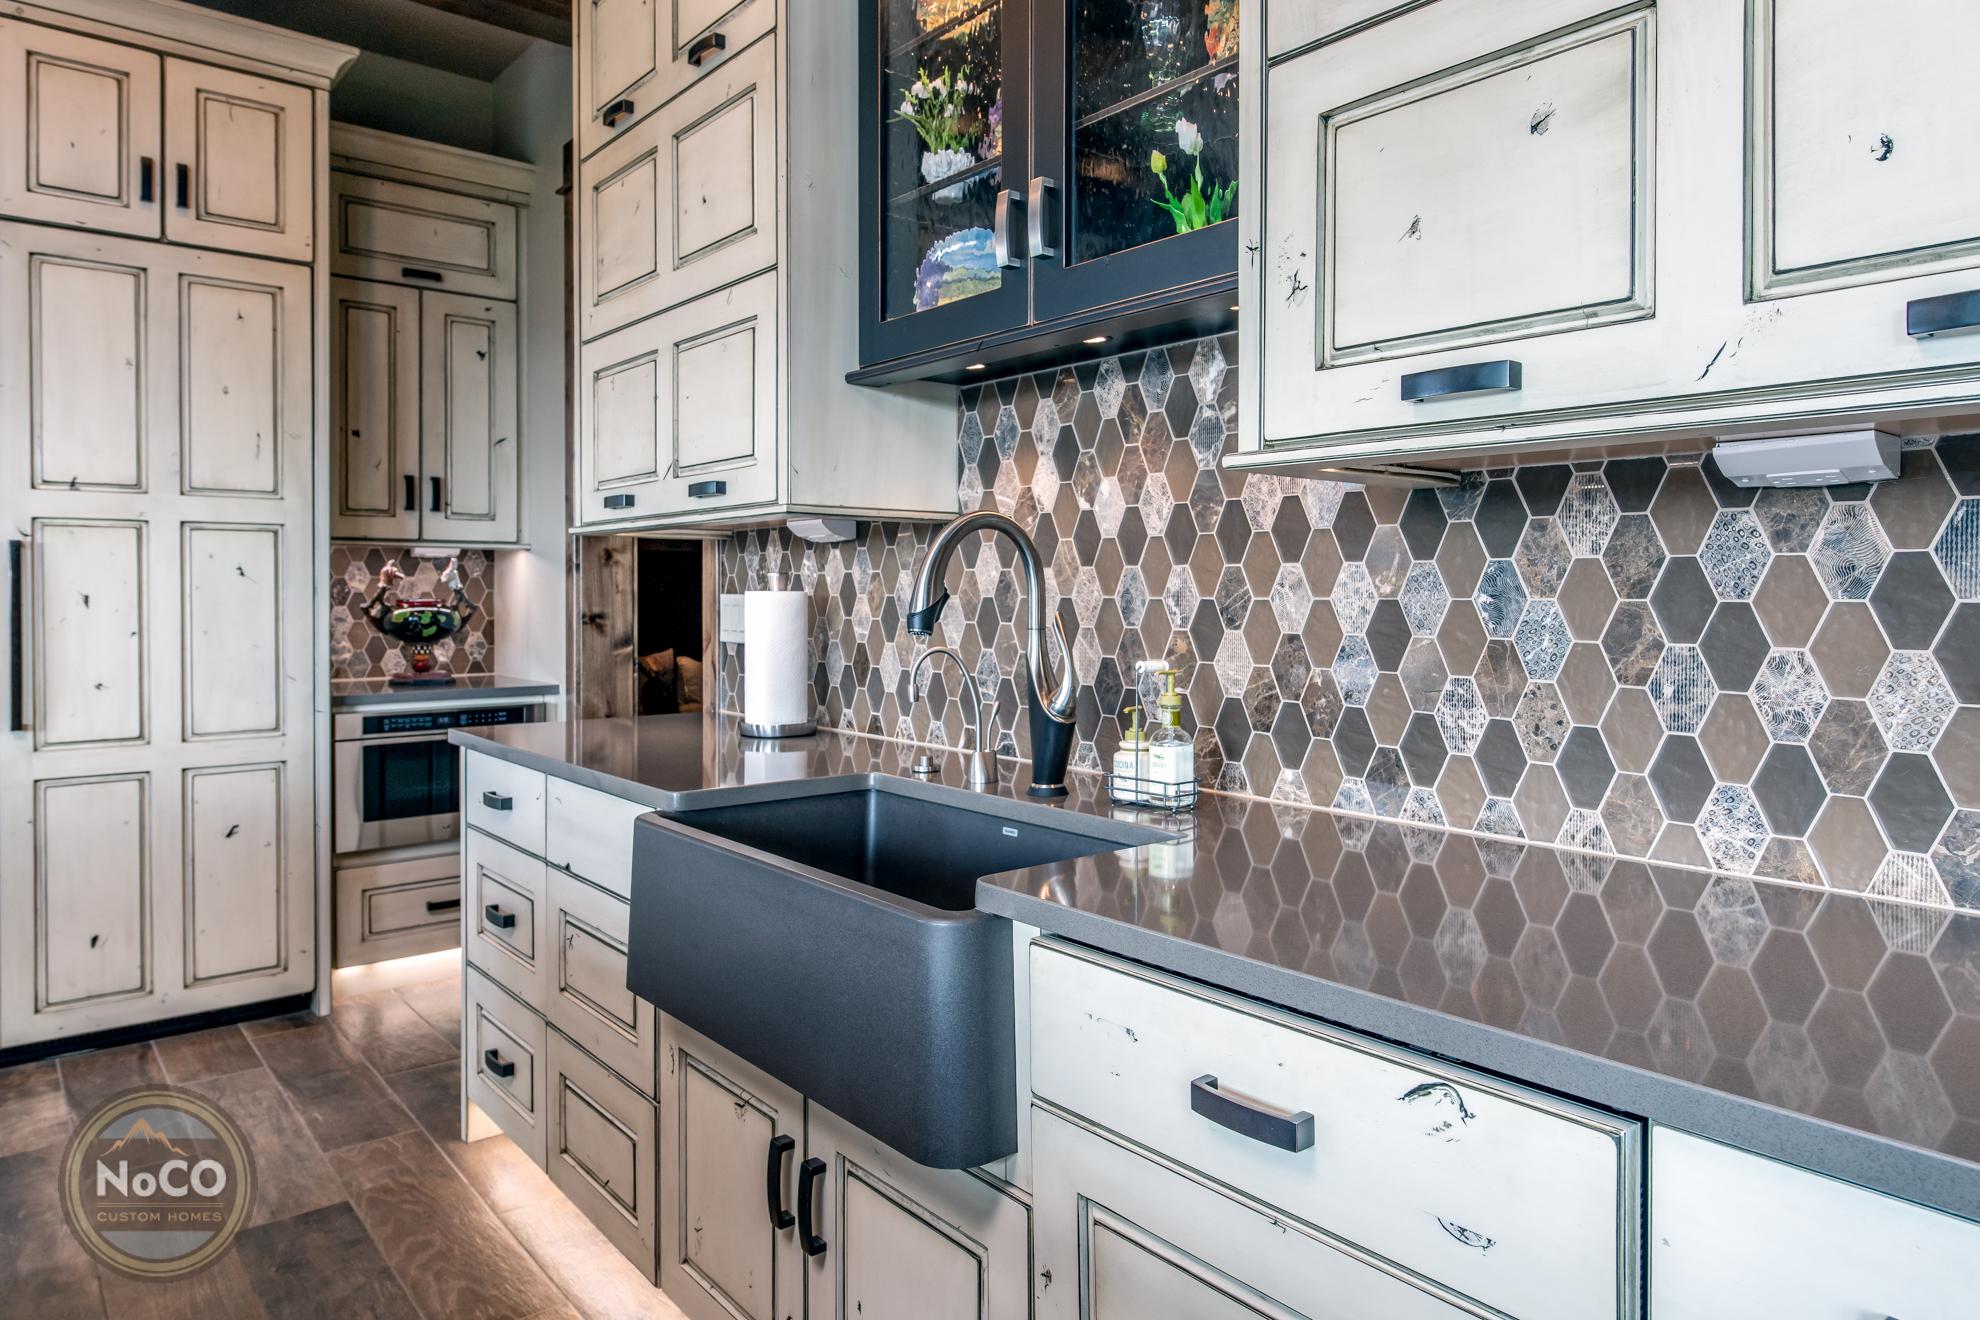 colorado custom home kitchen backsplash